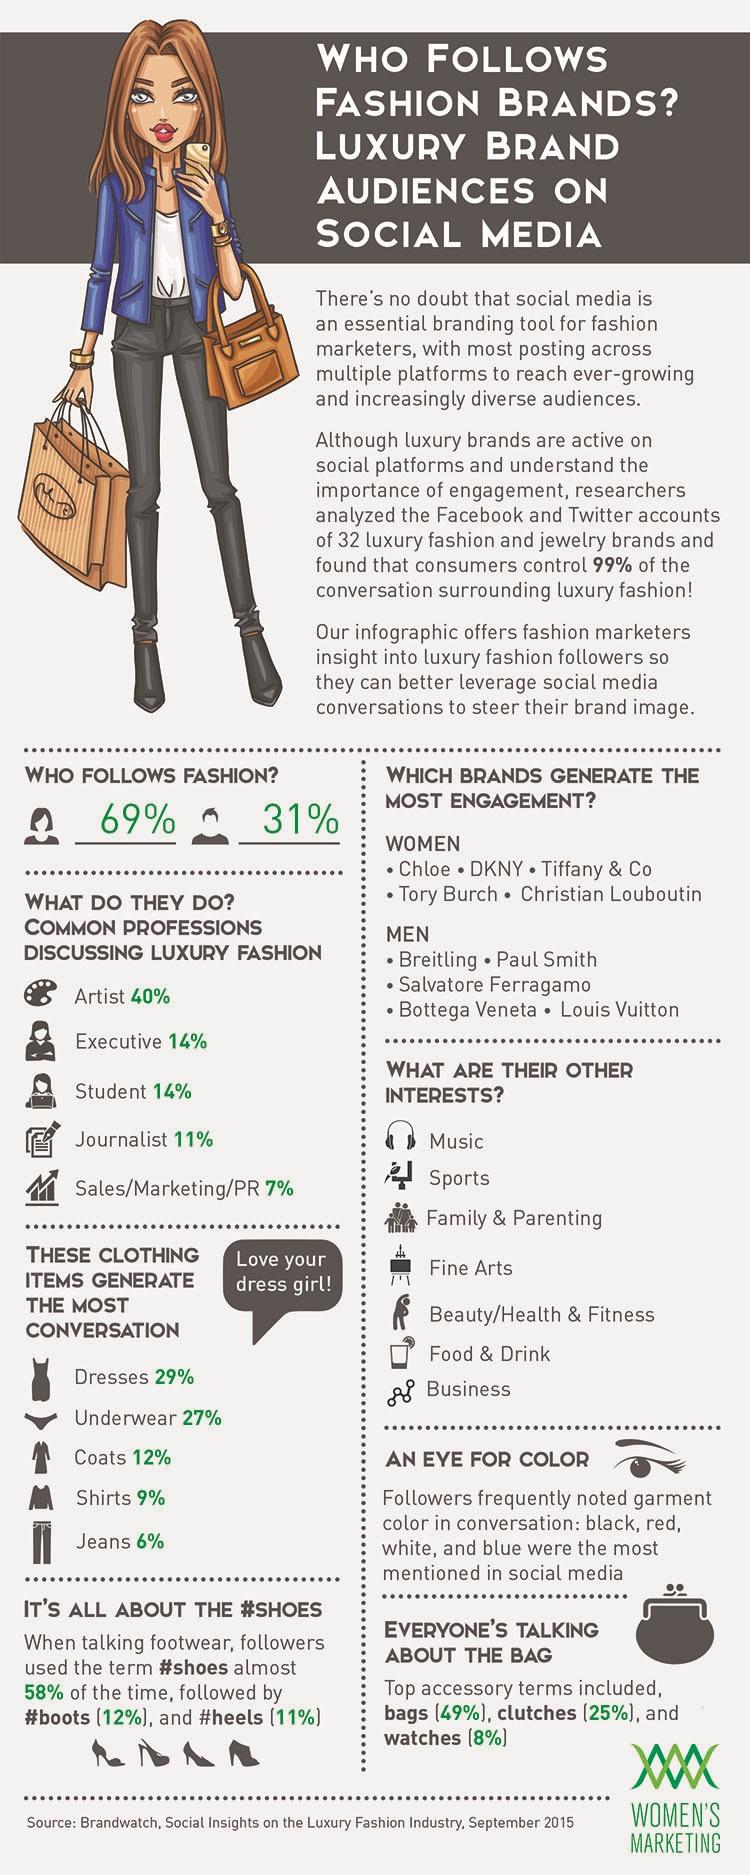 LuxuryBrandsOnSocial_Infographic.indd